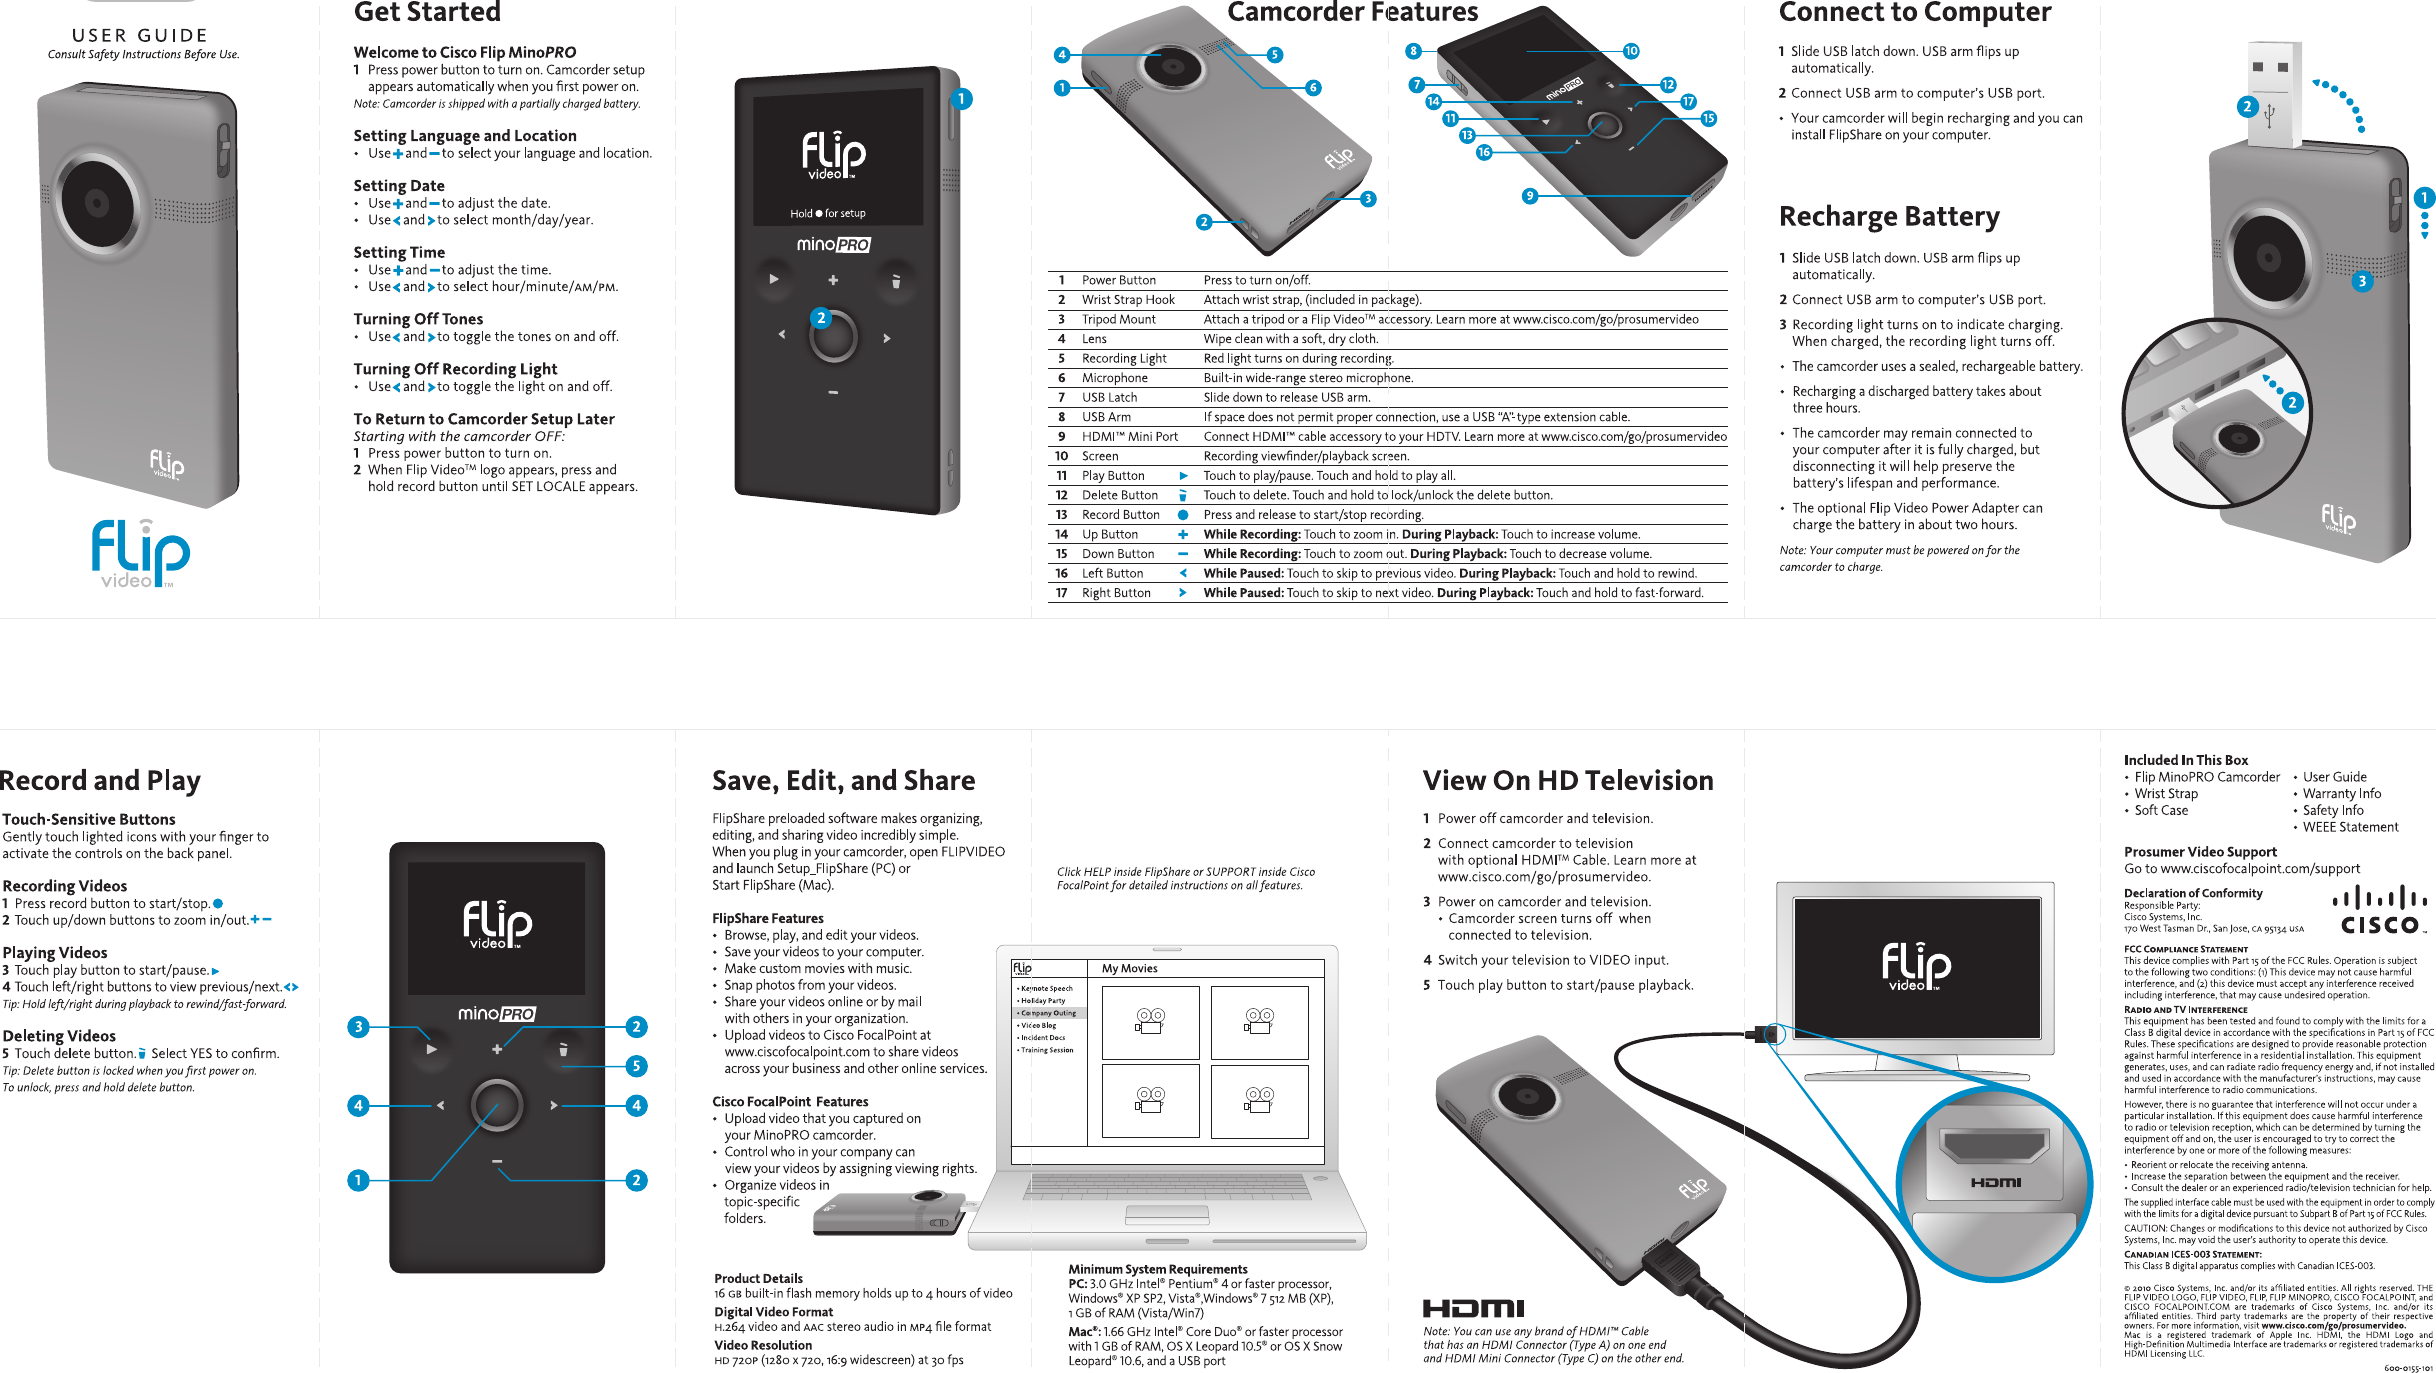 flip mino hd user manual ebook rh flip mino hd user manual ebook zettadata solu